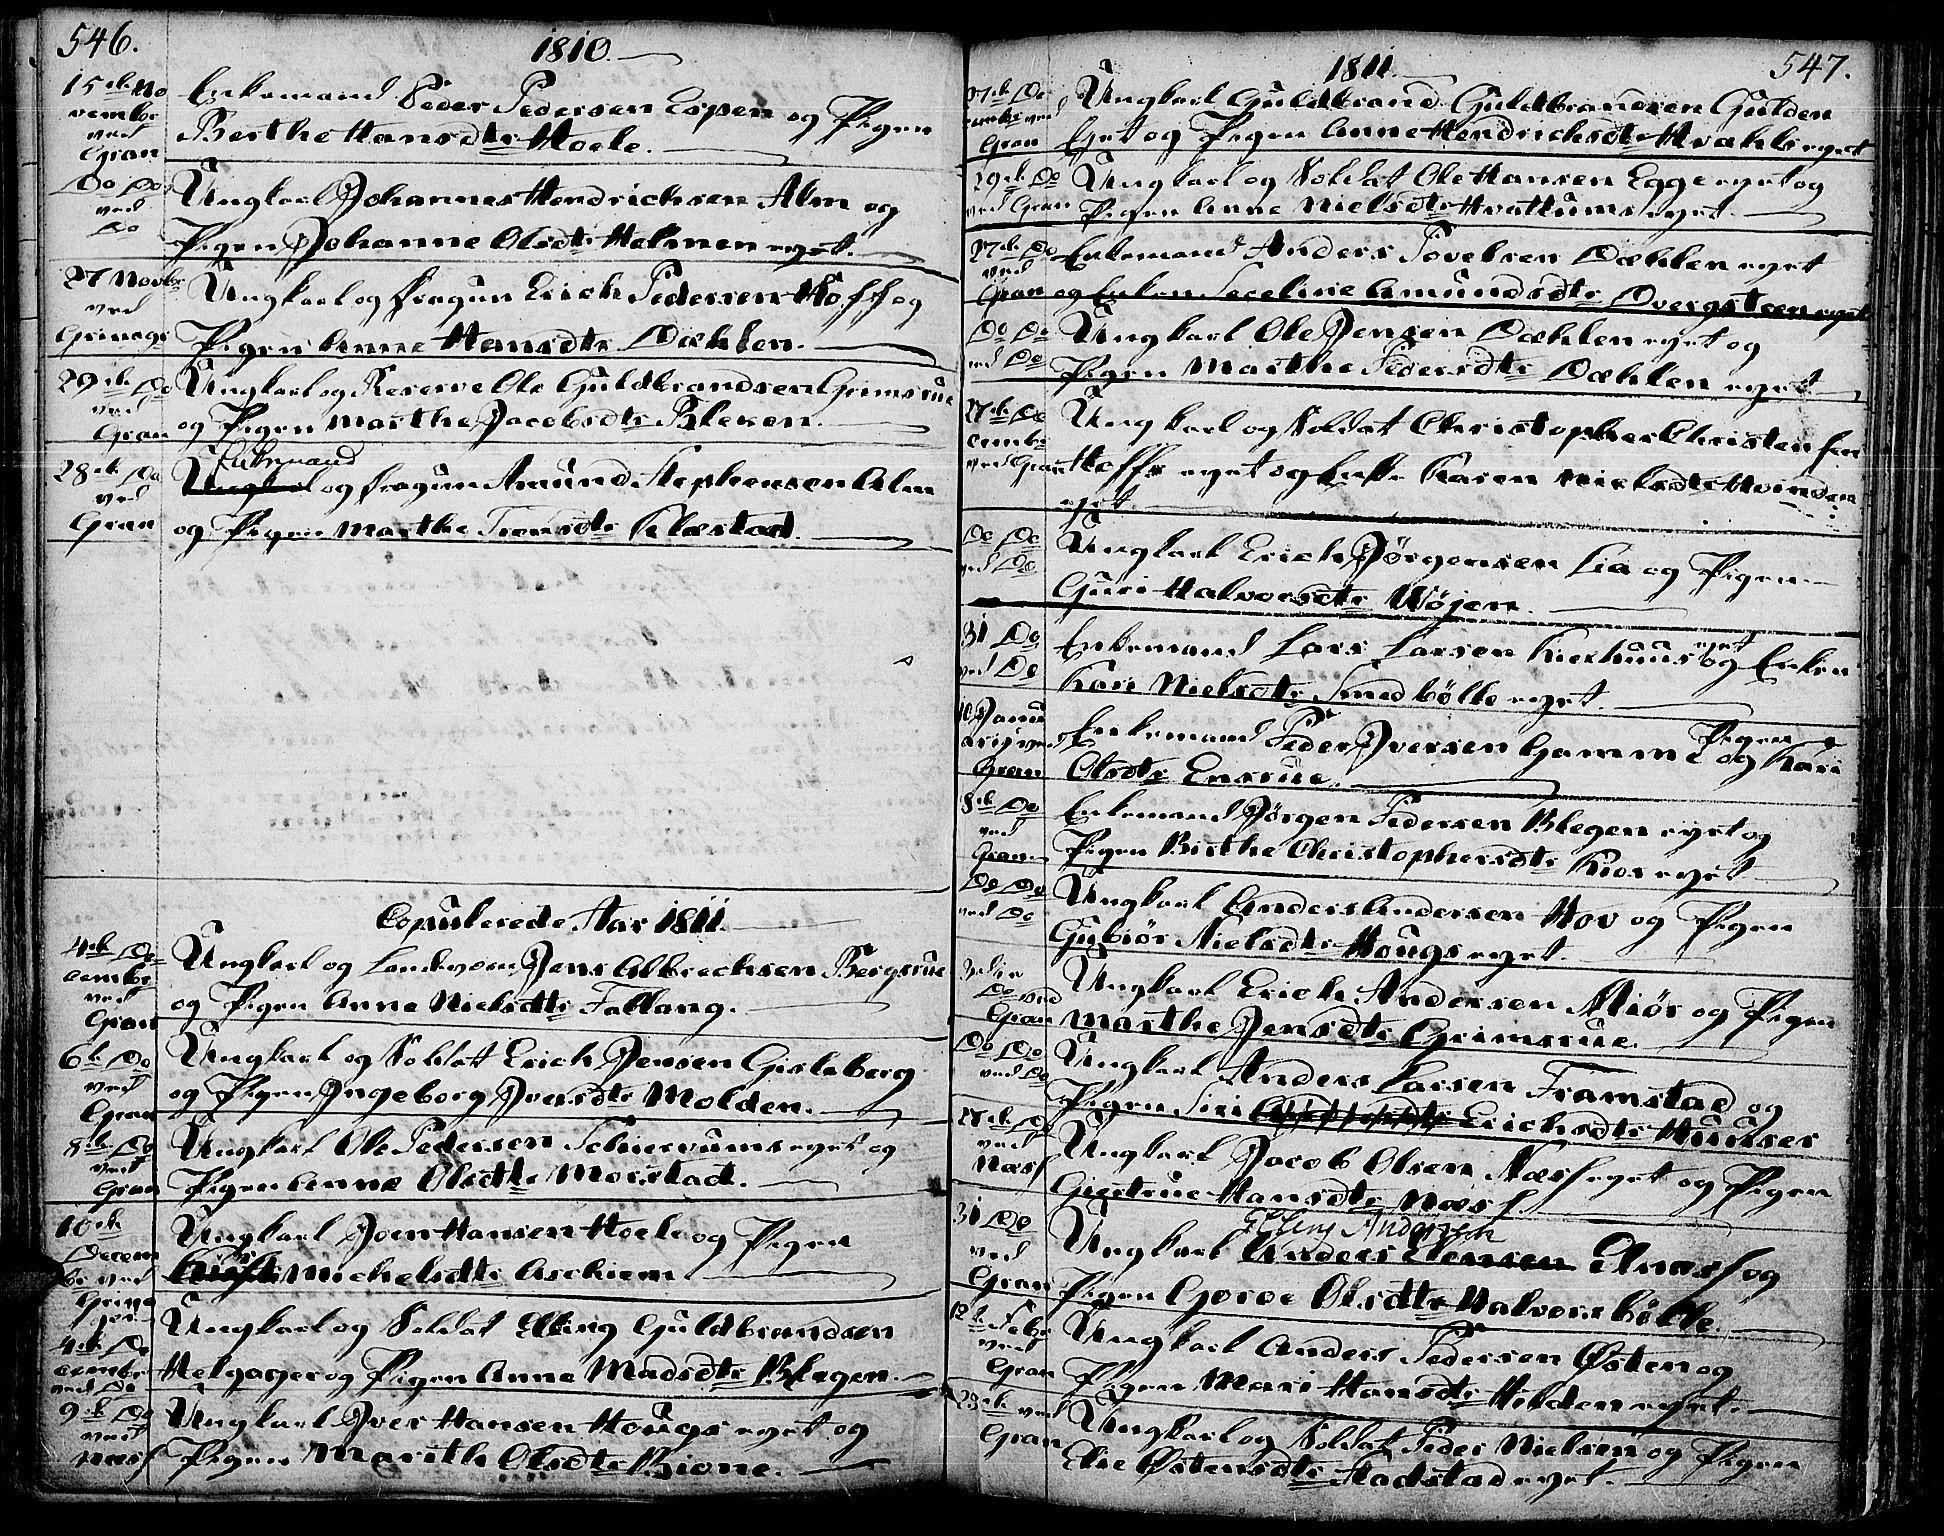 SAH, Gran prestekontor, Ministerialbok nr. 6, 1787-1824, s. 546-547